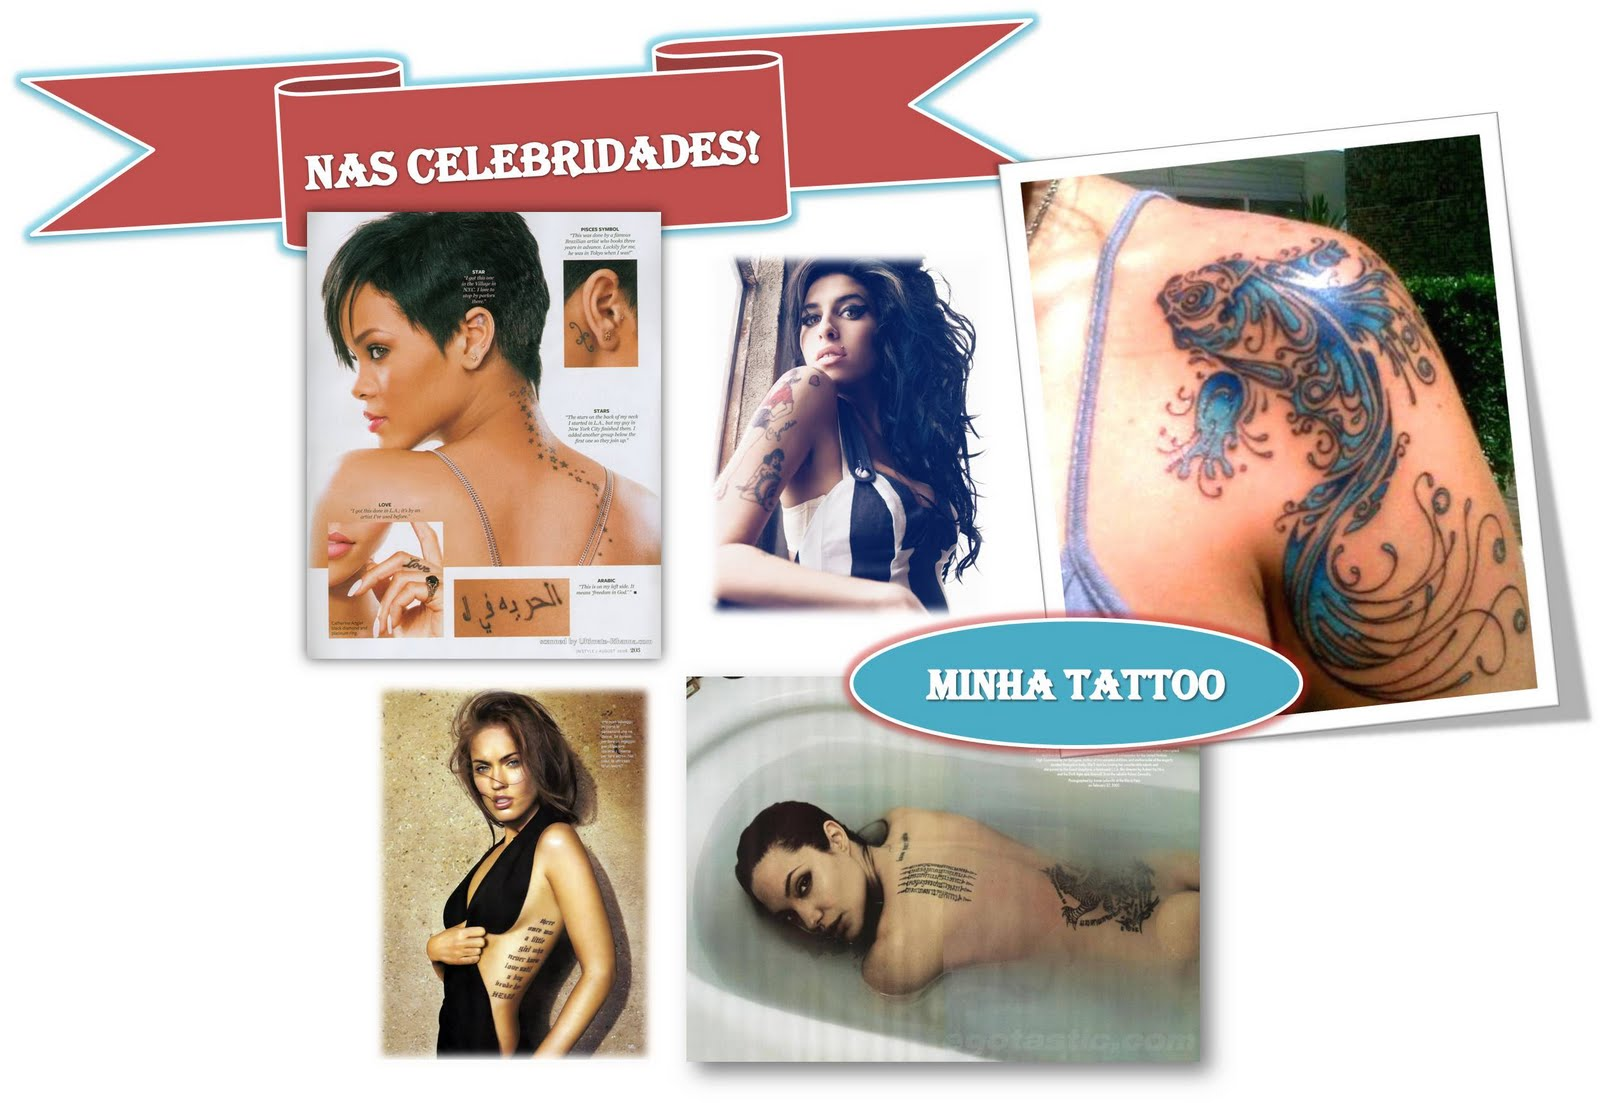 http://3.bp.blogspot.com/-PNXRUhgrfts/TeQPL4AEwxI/AAAAAAAAATw/4g7LosEdaHM/s1600/tattoo.jpg